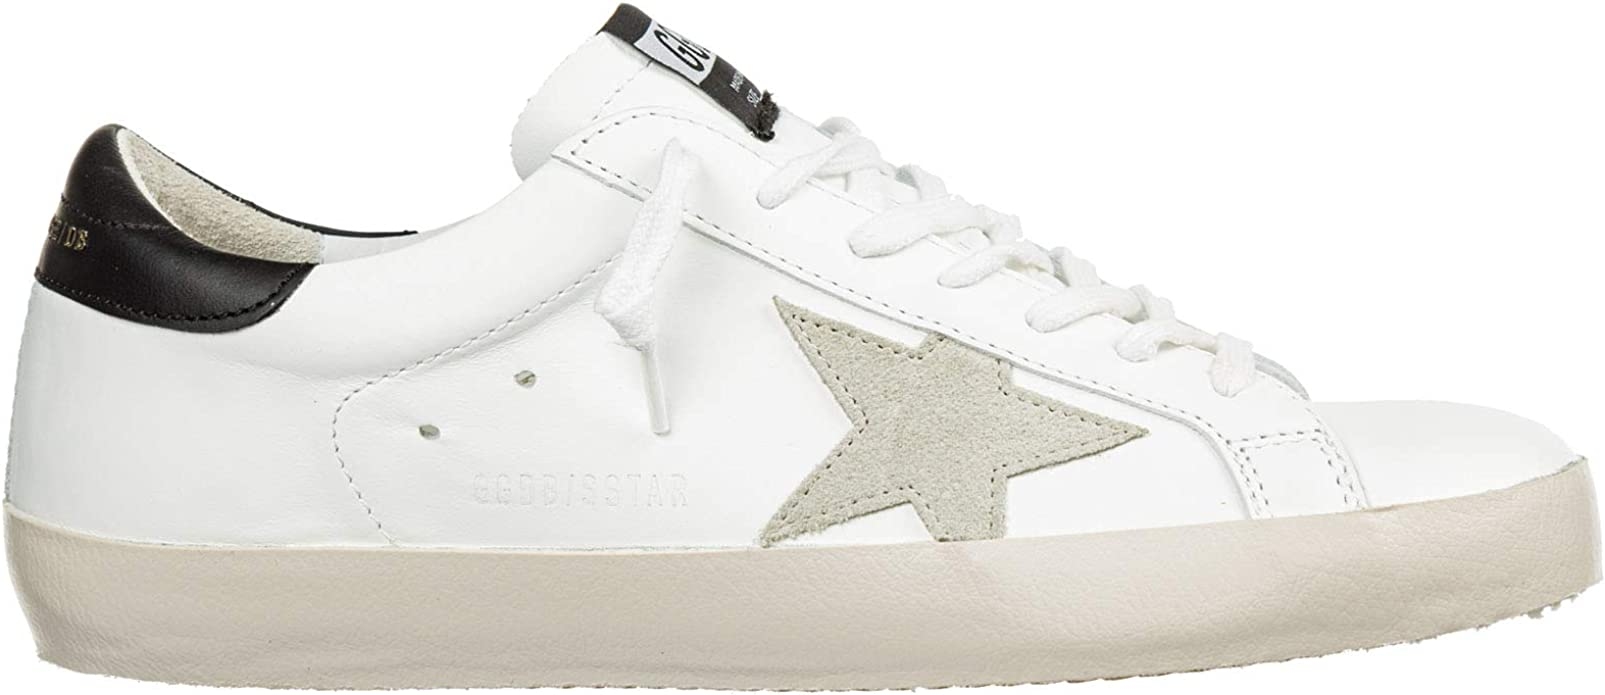 Sneakers Golden Goose G35ms590 E73